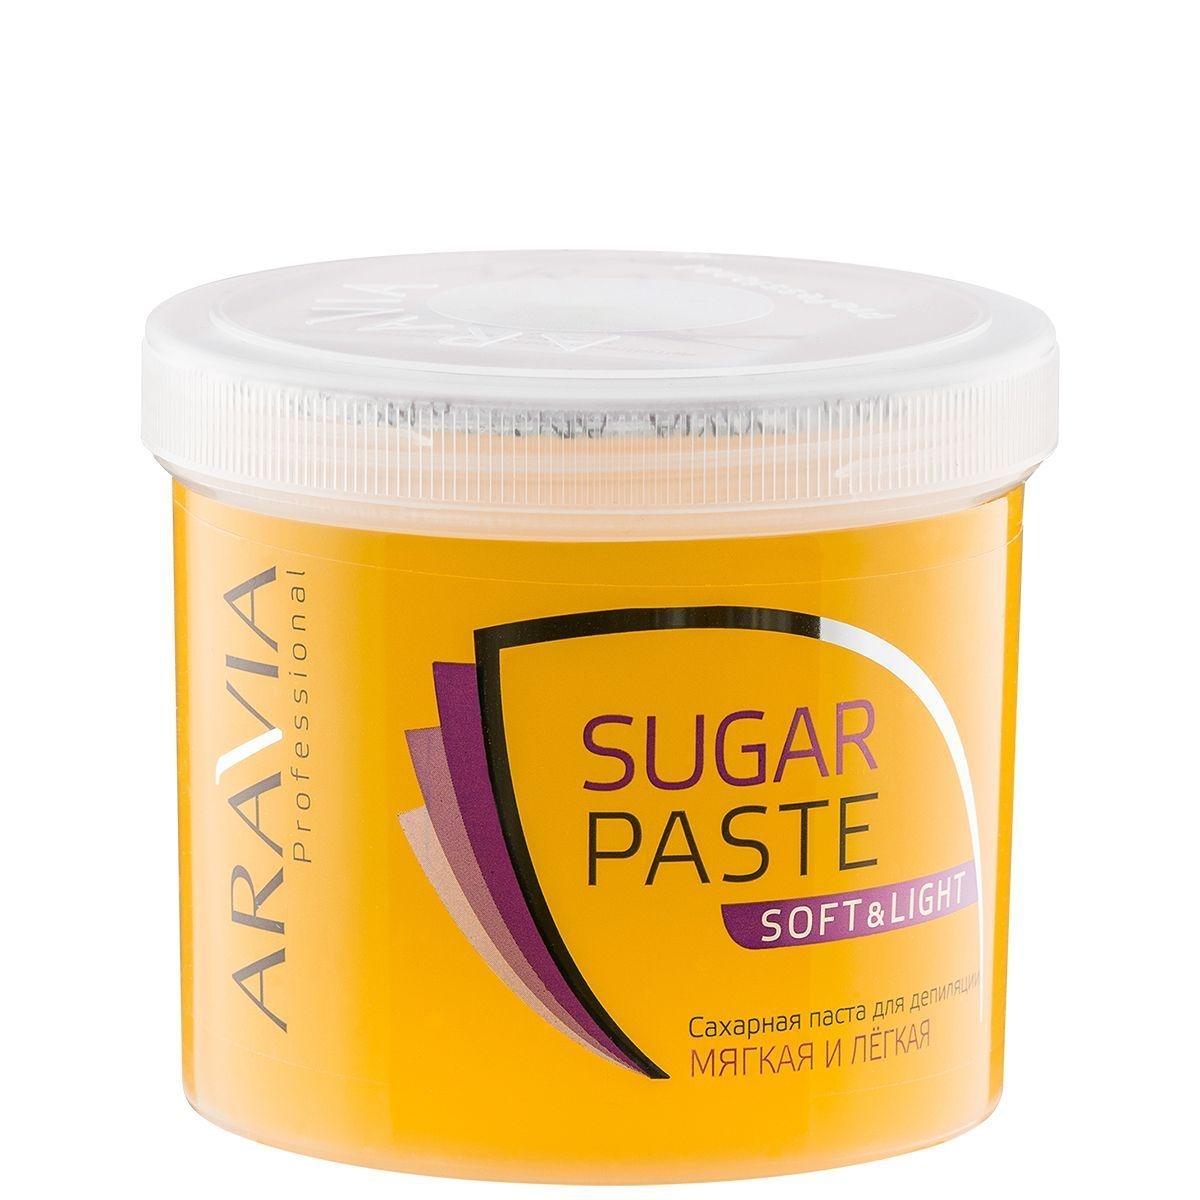 ARAVIA Паста  Sugar Paste Сахарная для Депиляции Мягкая и Легкая Мягкой Консистенции, 750 гр